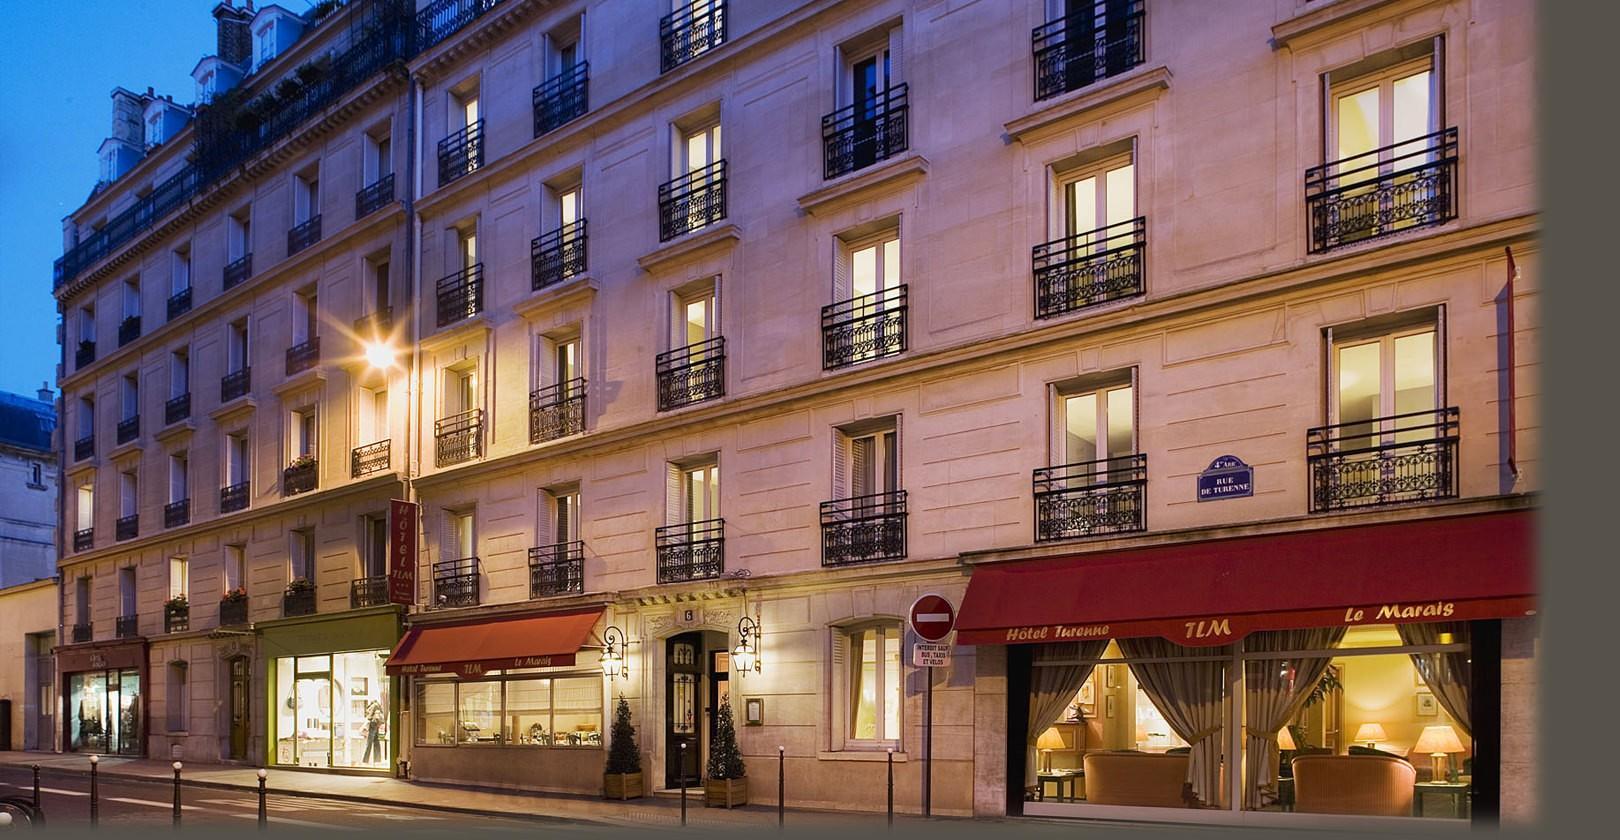 Hotel Turenne Le Marais Hotel Paris